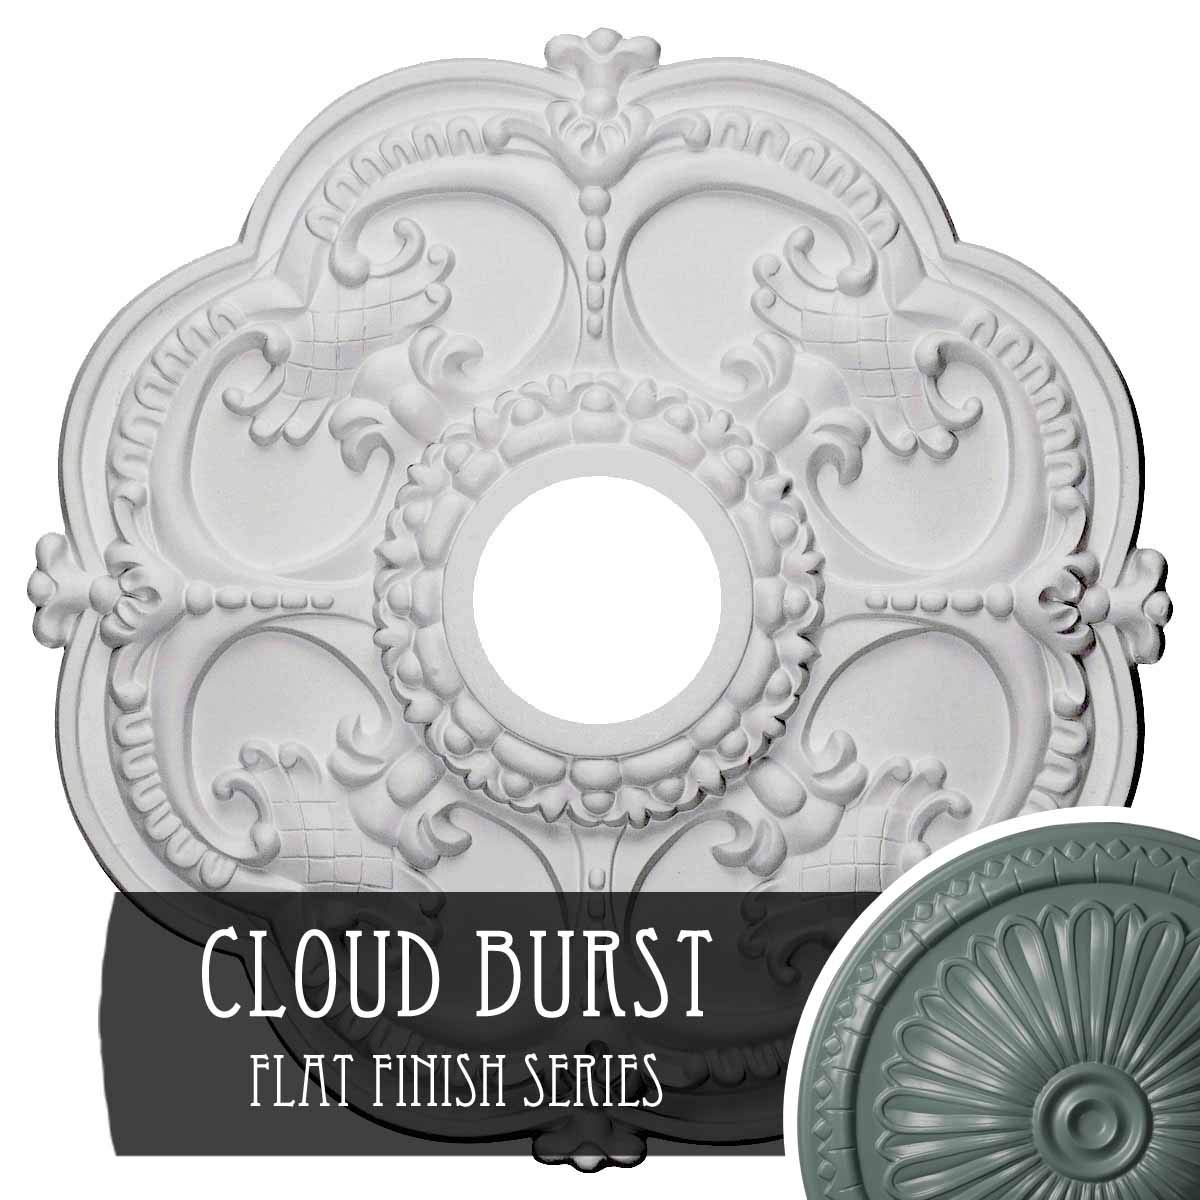 Cloud Burst Ekena Millwork CM17ROUWF redherham Ceiling Medallion, 18 OD x 3 1 2 ID x 1 1 2 P, Ultra Pure White